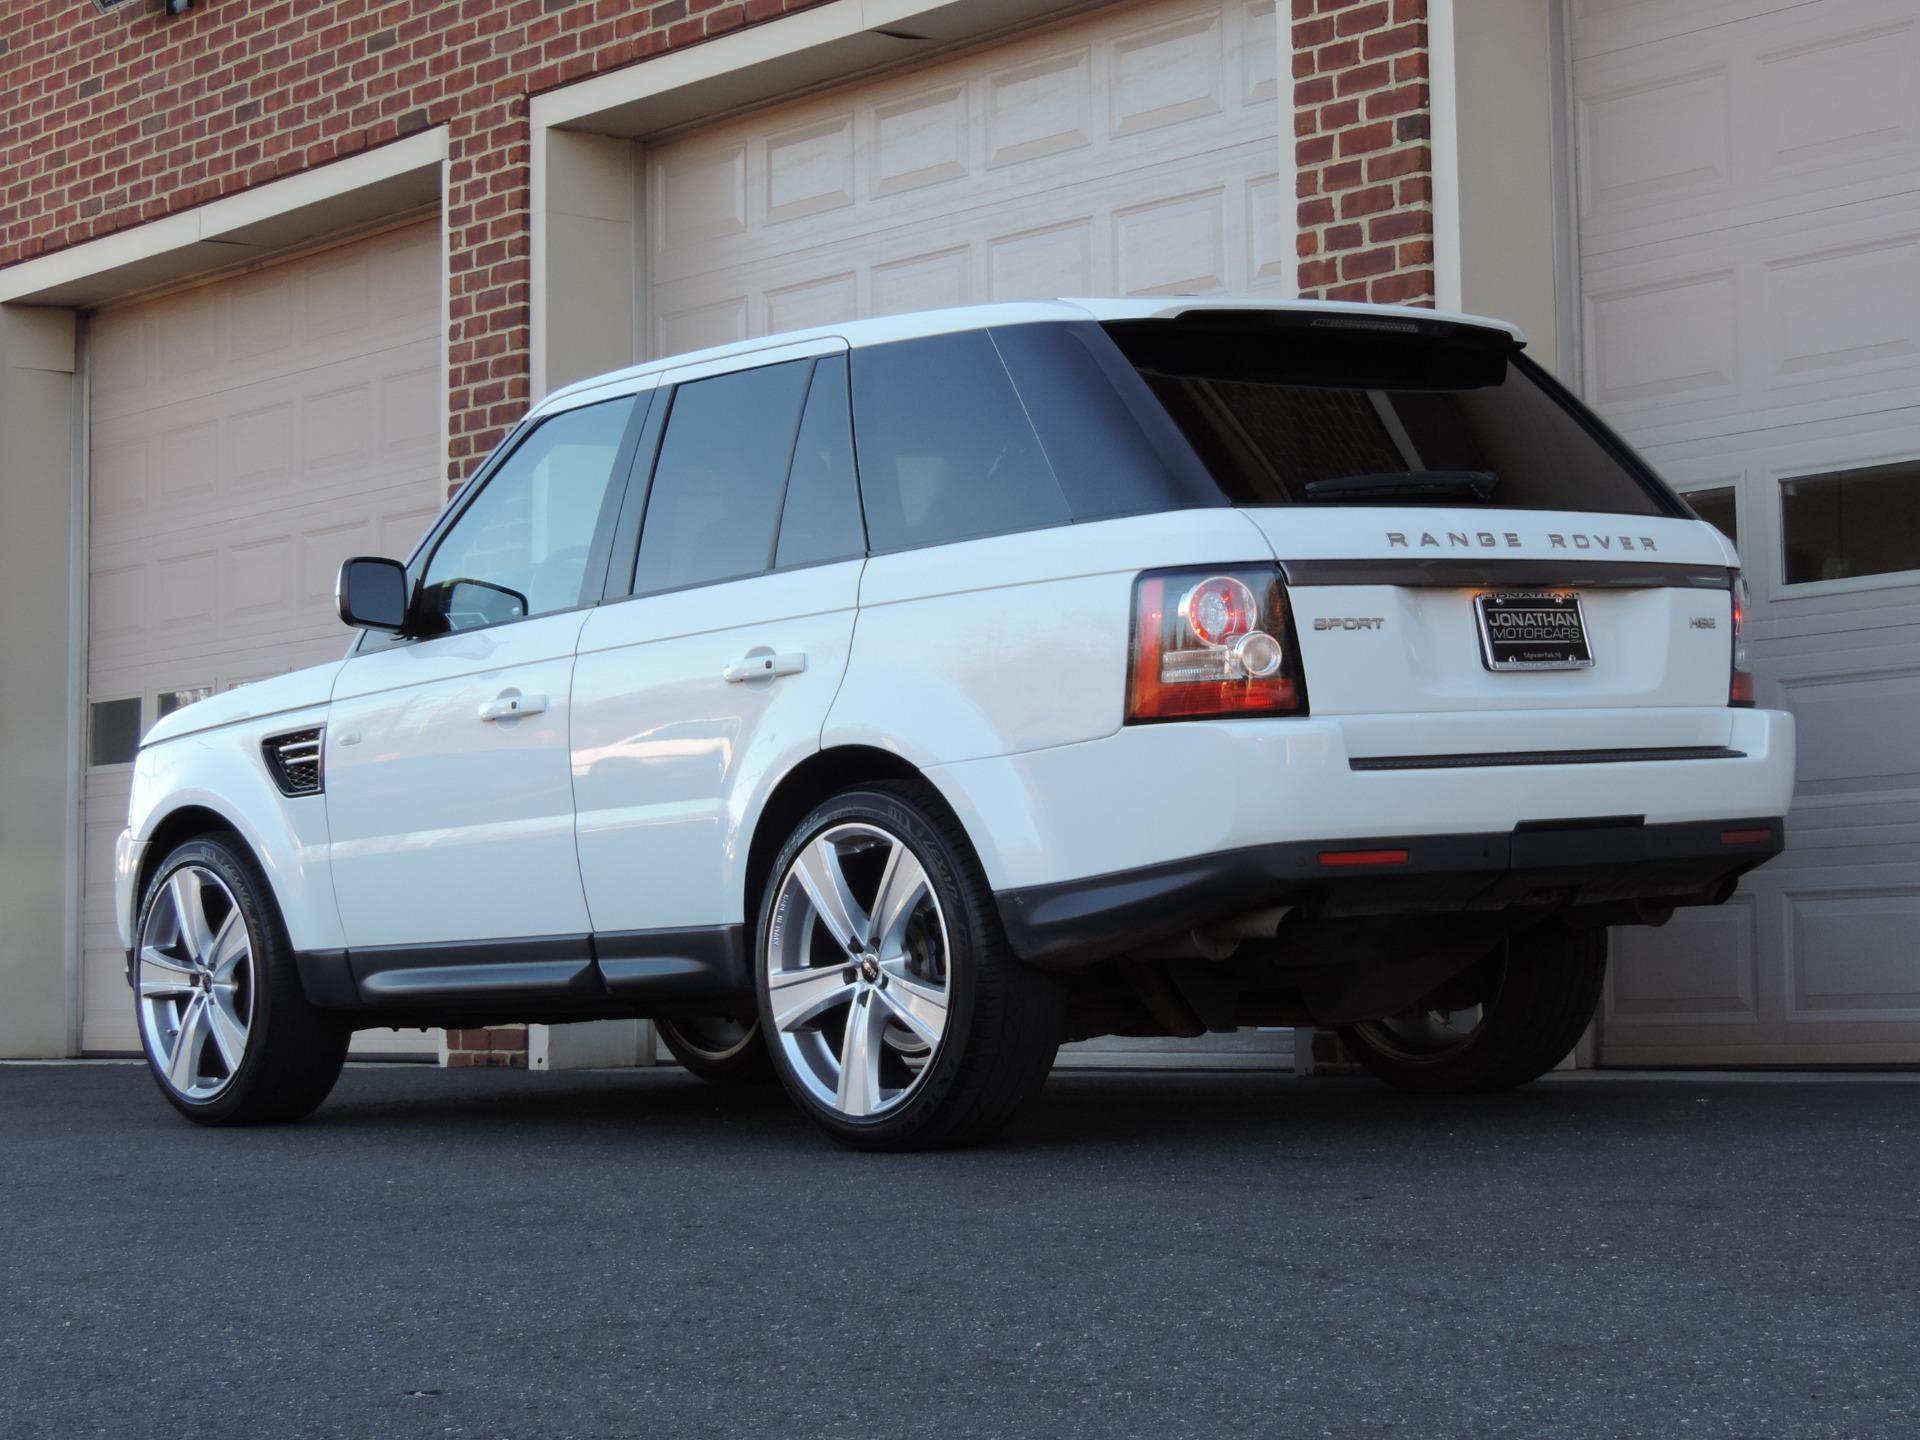 2012 land rover range rover sport hse stock 755954 for sale near edgewater park nj nj land